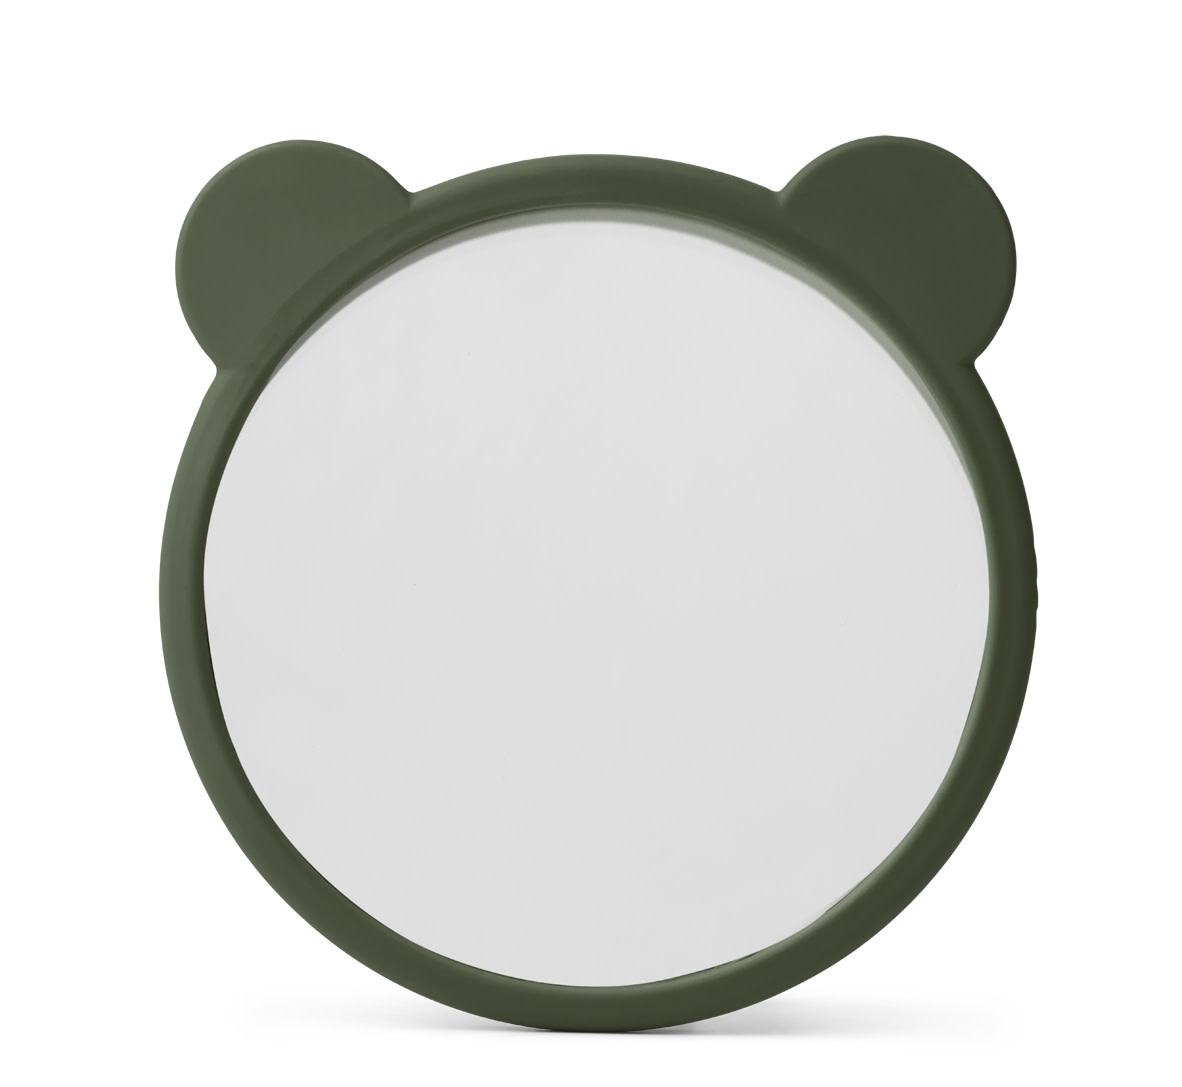 Heidi mirror hunter green-1